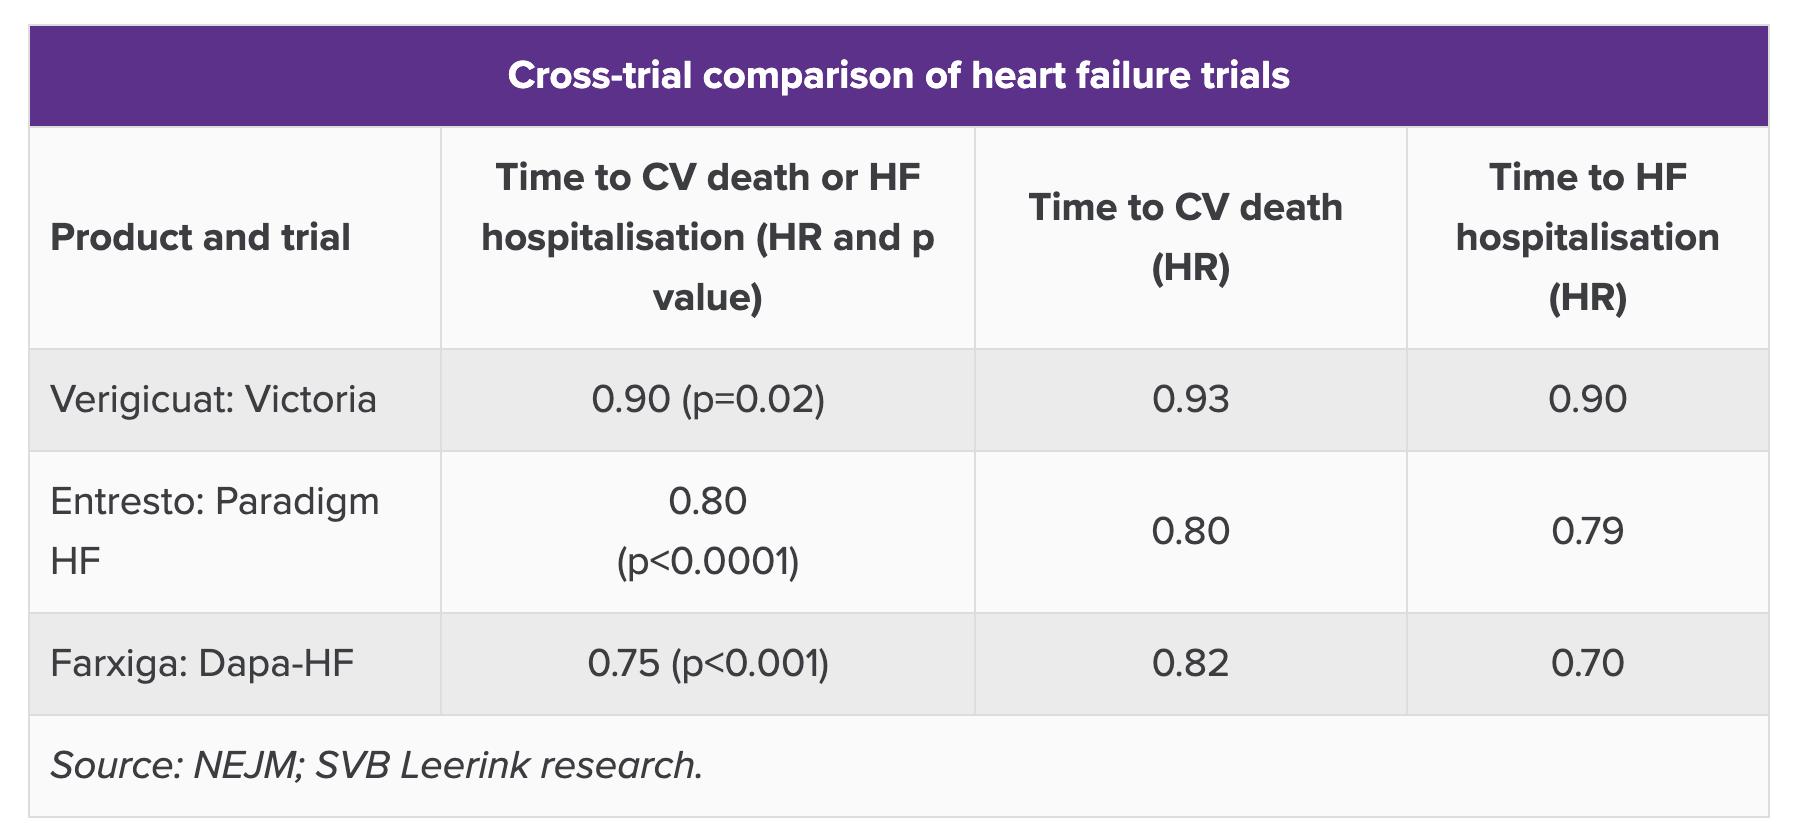 entresto farxiga vericiguat cross trial comparison of heart failure trials - «Форсига»: новый препарат для лечения хронической сердечной недостаточности